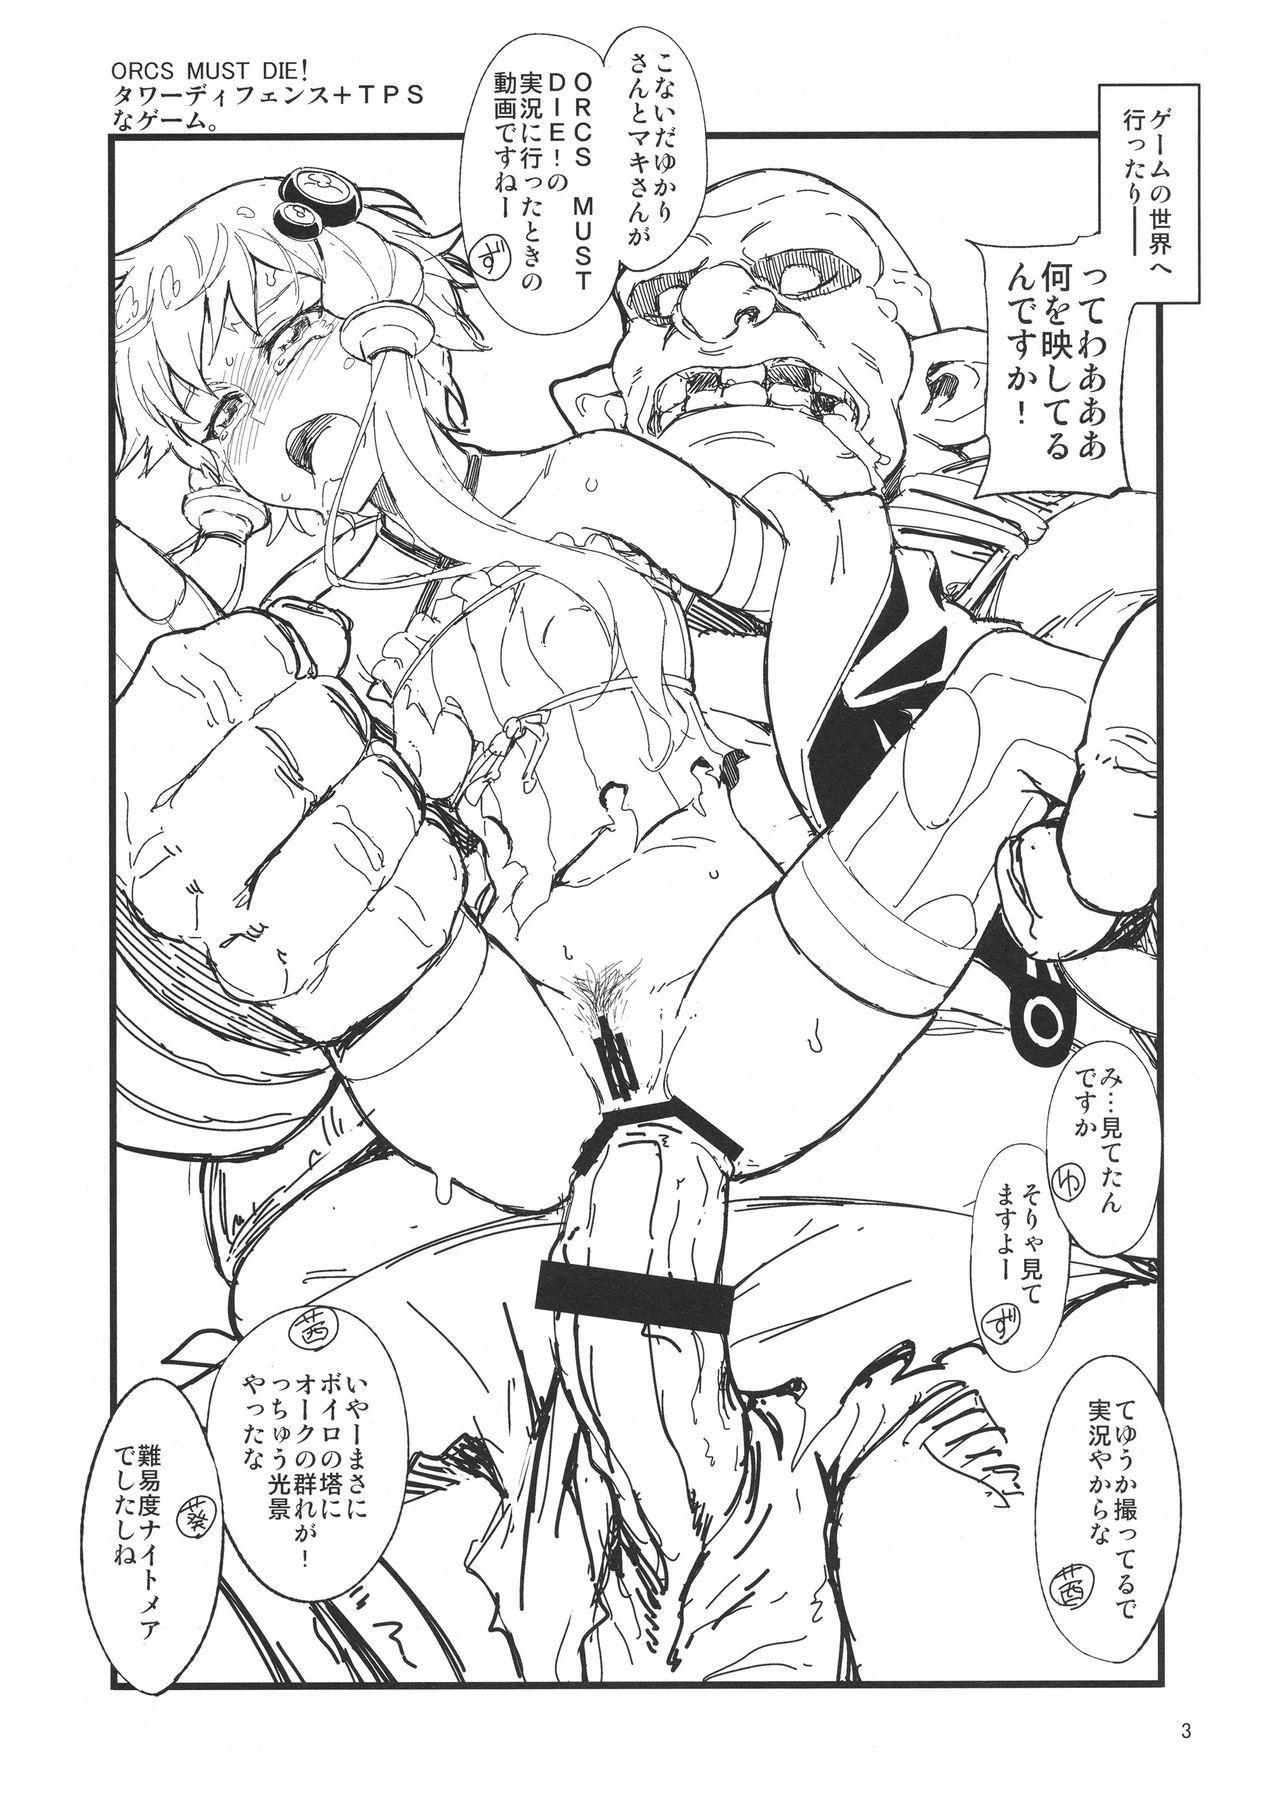 Voiceroid-tachi no Nanka Sonnakoto Aruyo ne 2